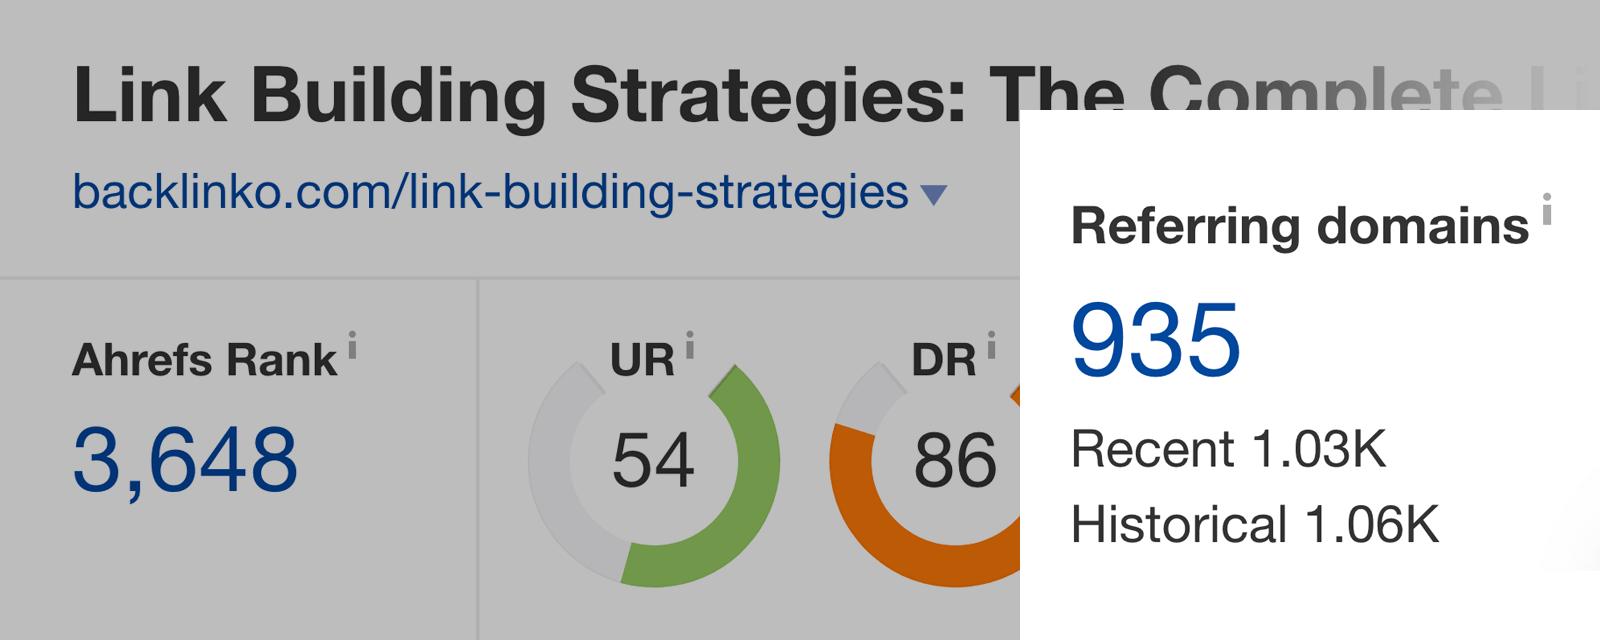 1585025611 7879 strategies referring domains